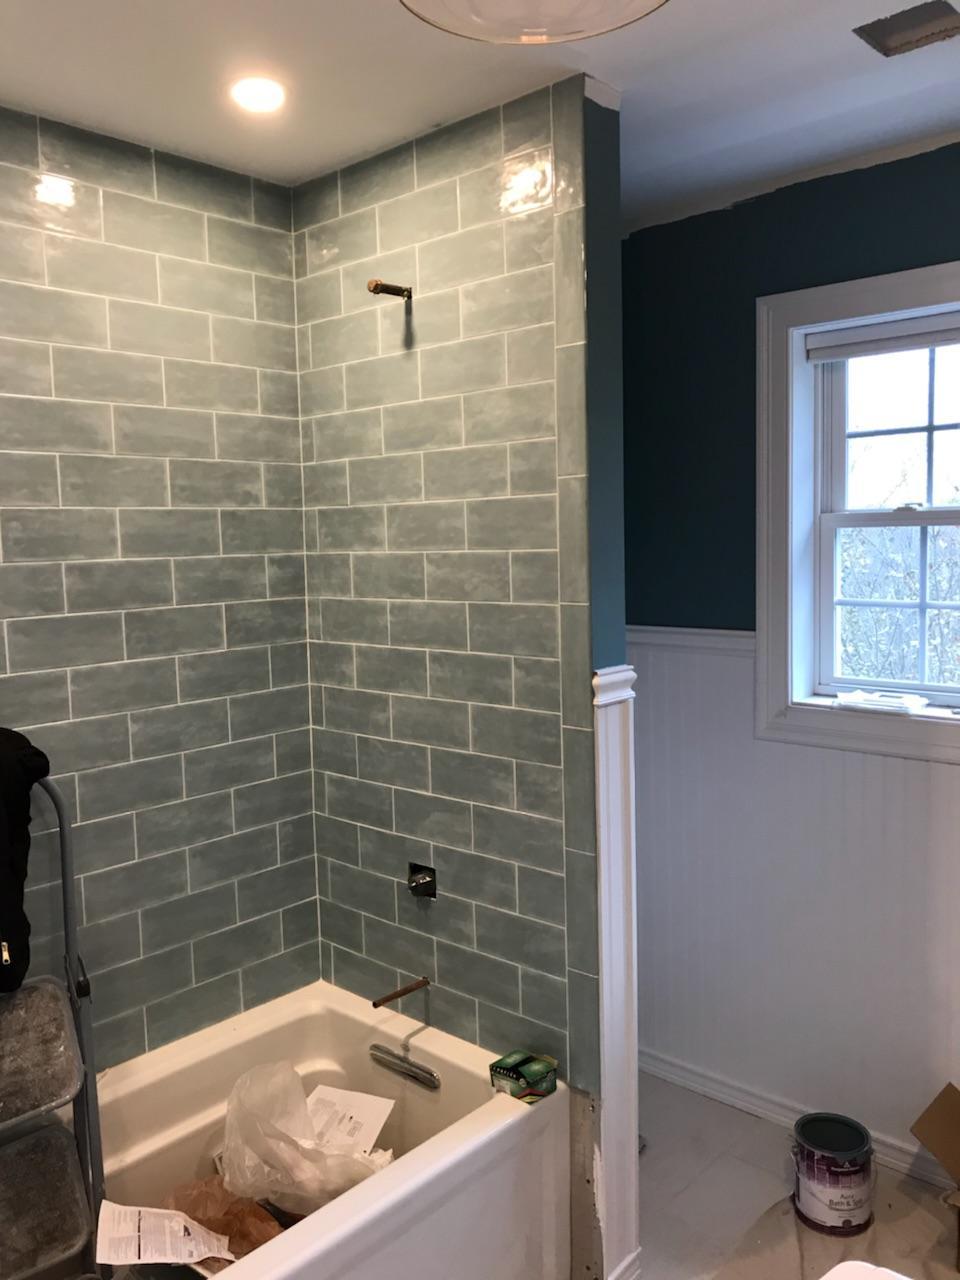 Shaw Remodeling - Progress photo - Bathroom Remodel in East Lyme CT (2).jpg